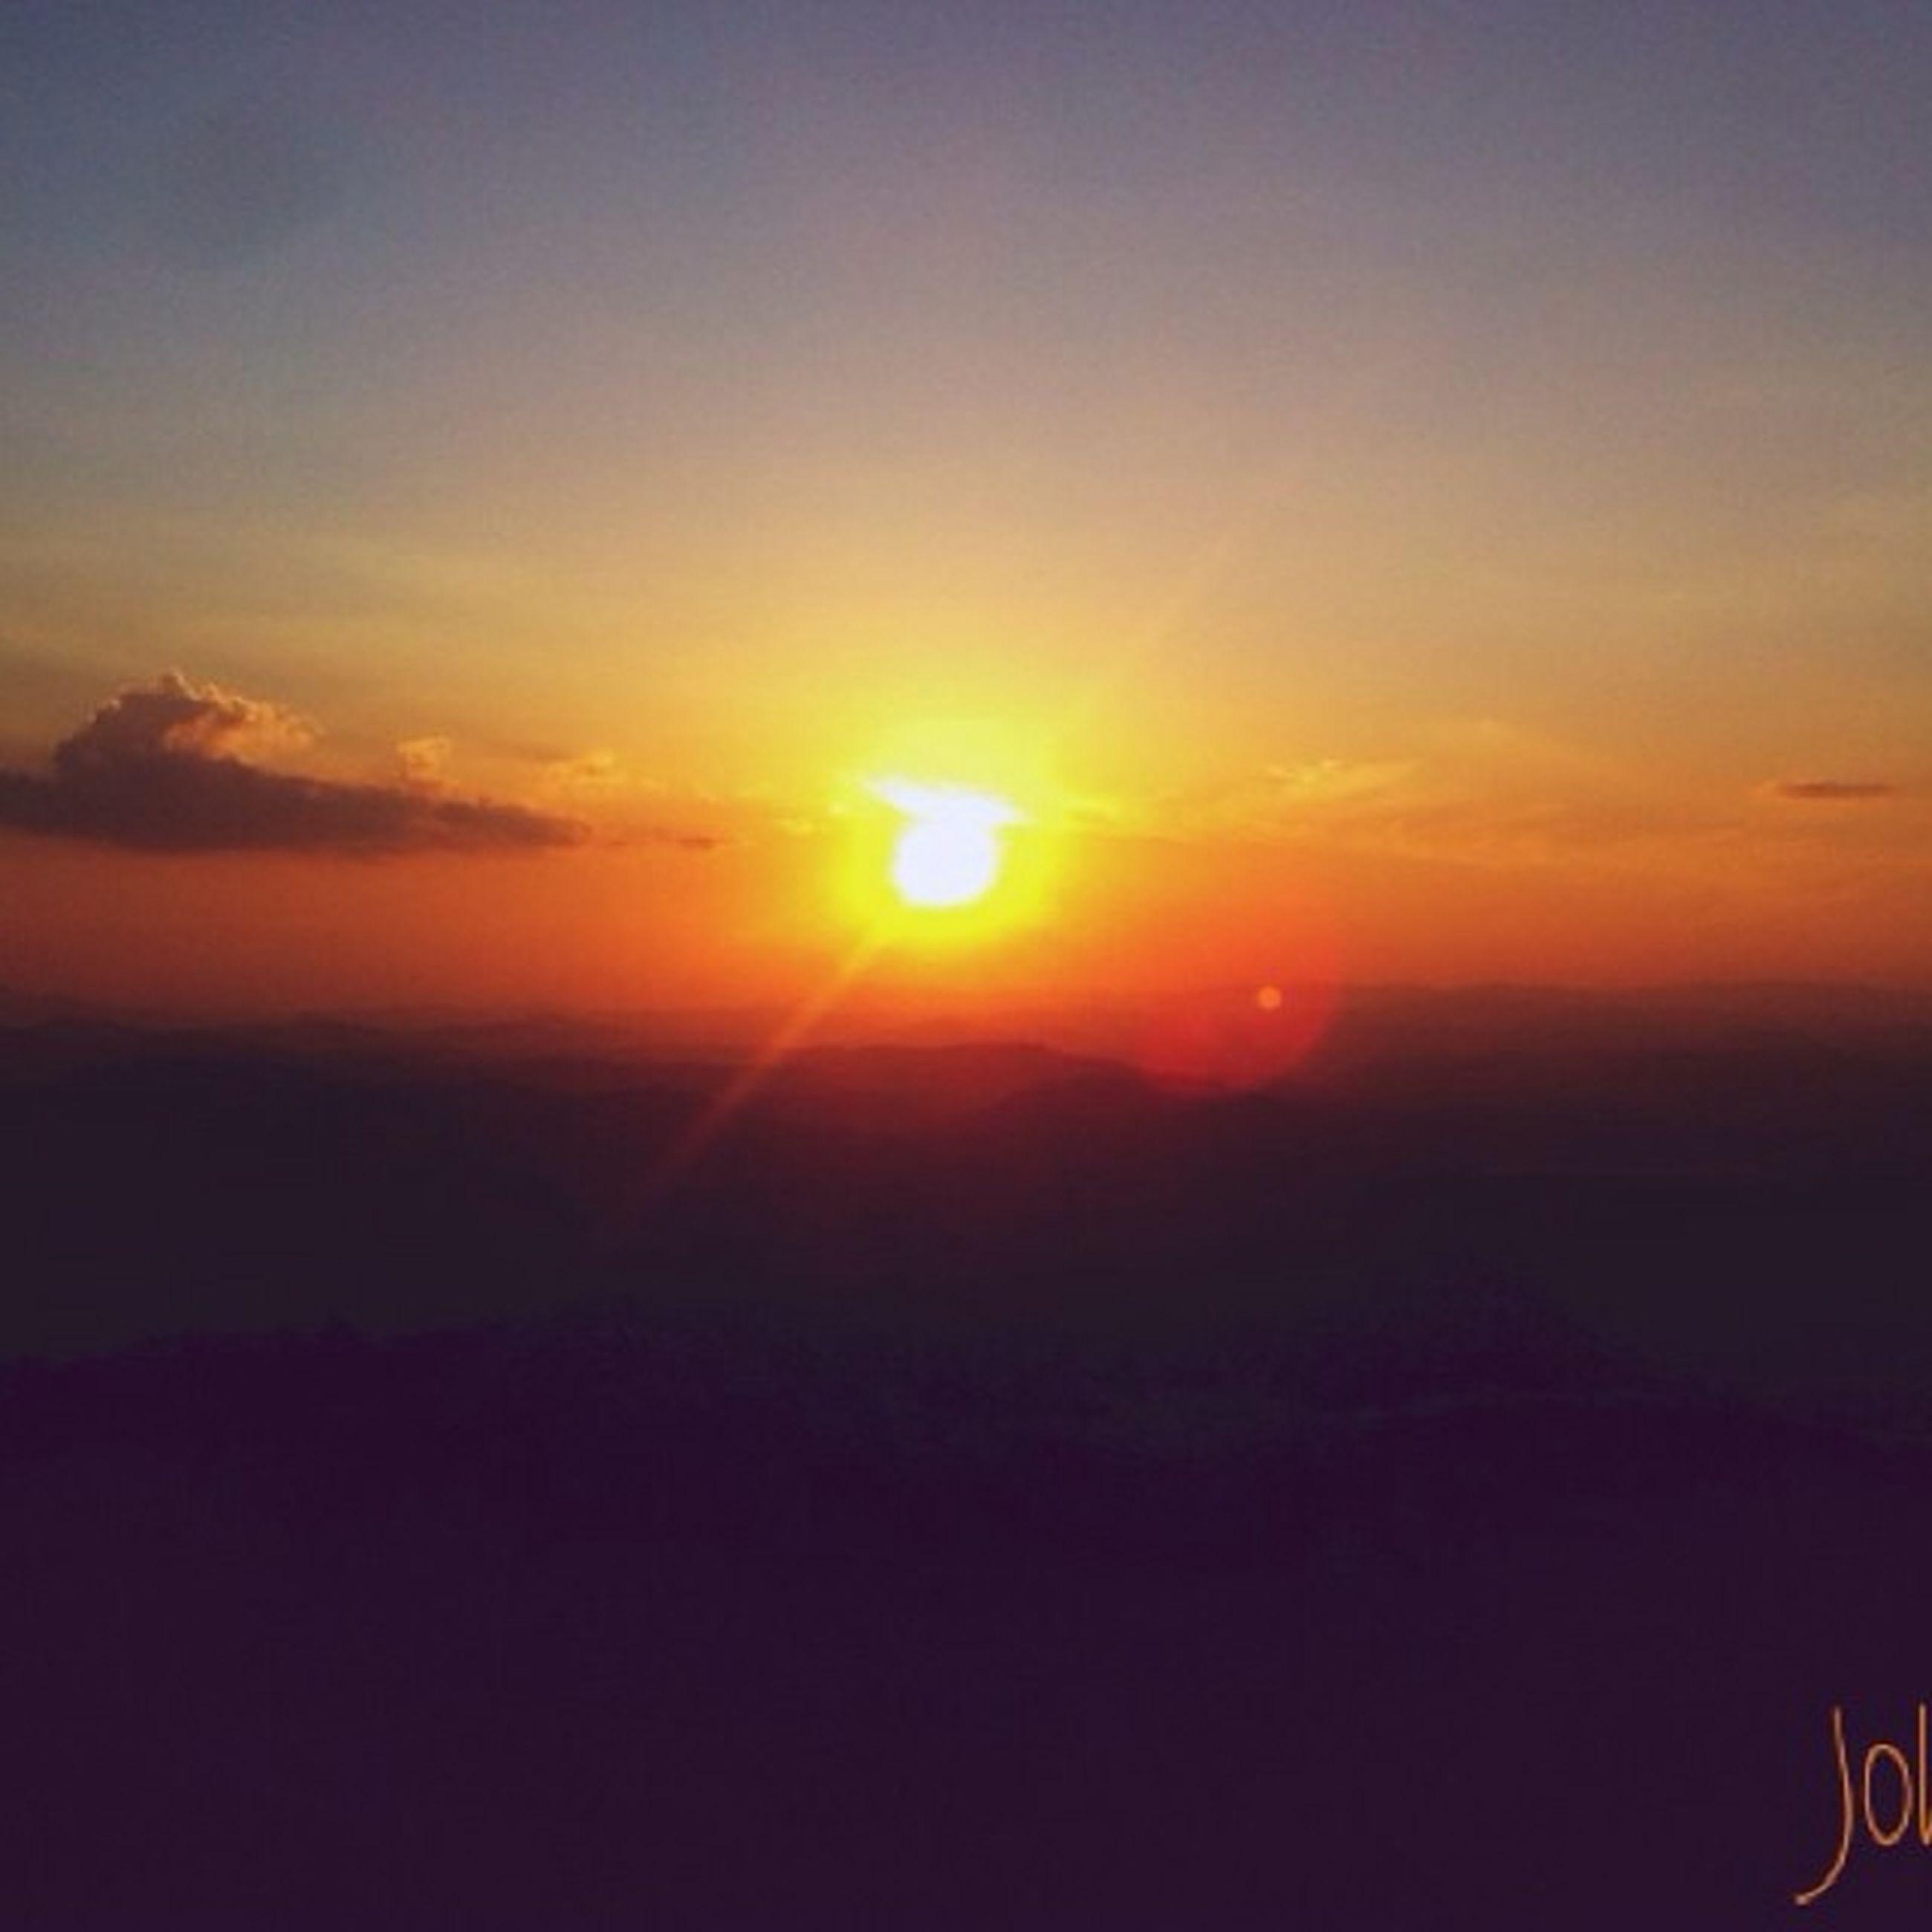 sunset, sun, scenics, orange color, tranquil scene, beauty in nature, tranquility, silhouette, sky, idyllic, landscape, nature, sunlight, copy space, outdoors, mountain, no people, remote, non-urban scene, sunbeam